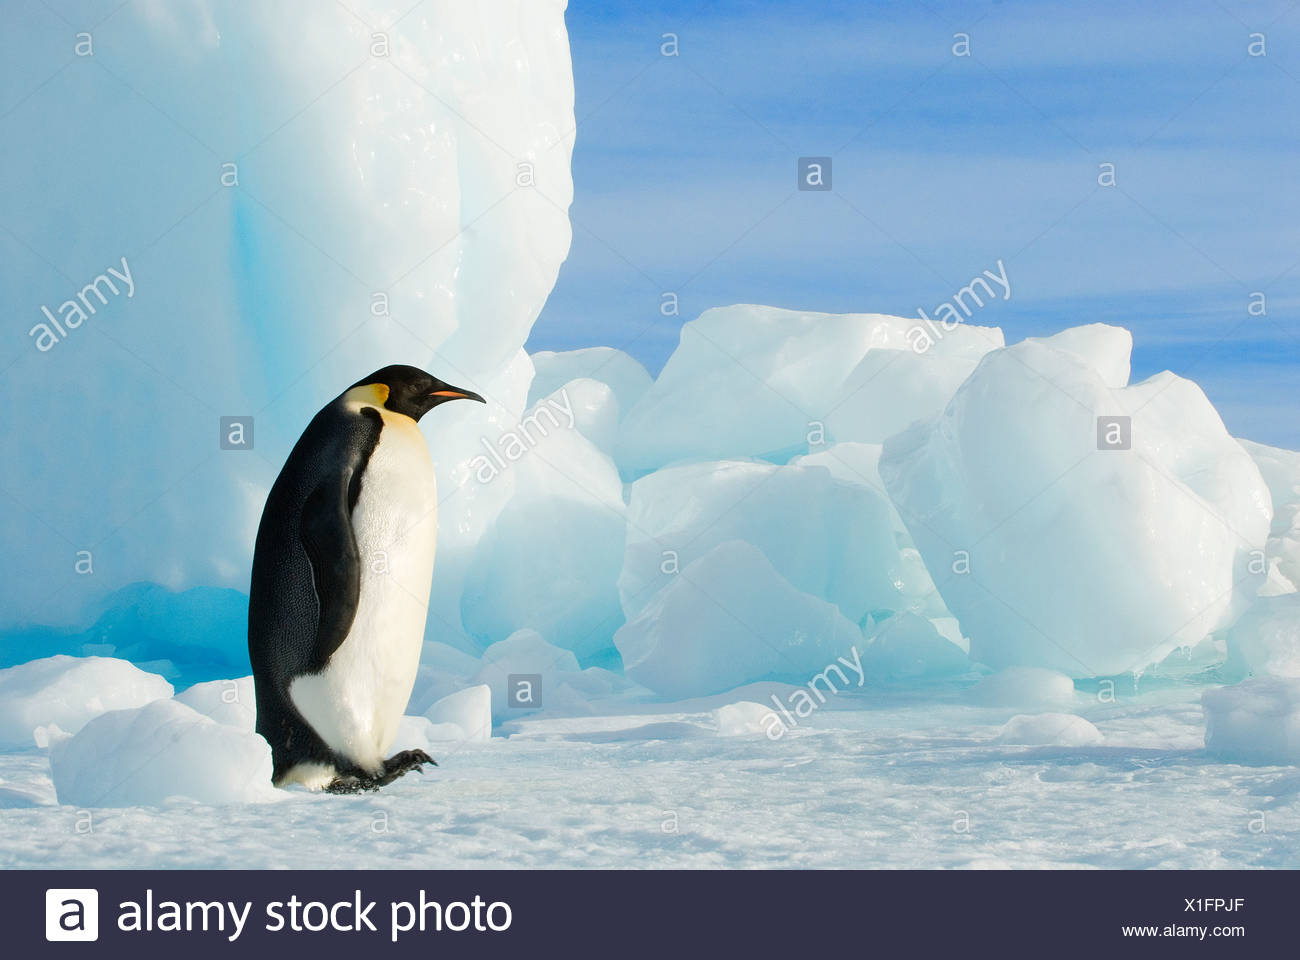 Adult emperor penguin (Aptenodytes forsteri) striding beside a grounded iceberg, Snow Hill Island, Antarctic Peninsula - Stock Image